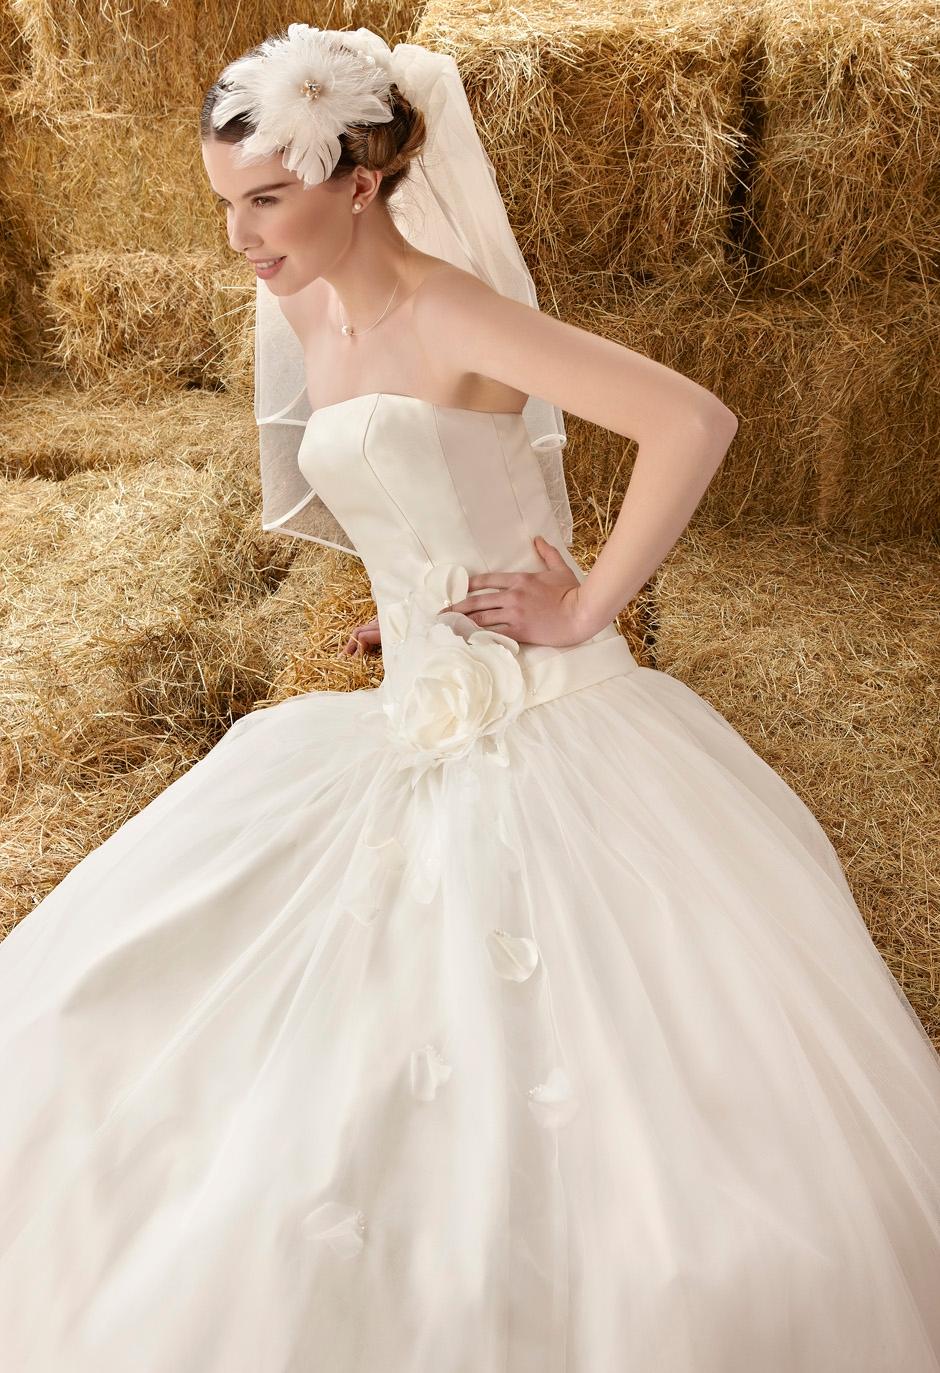 Vestido-de-noiva-CO_2012-Assam-001